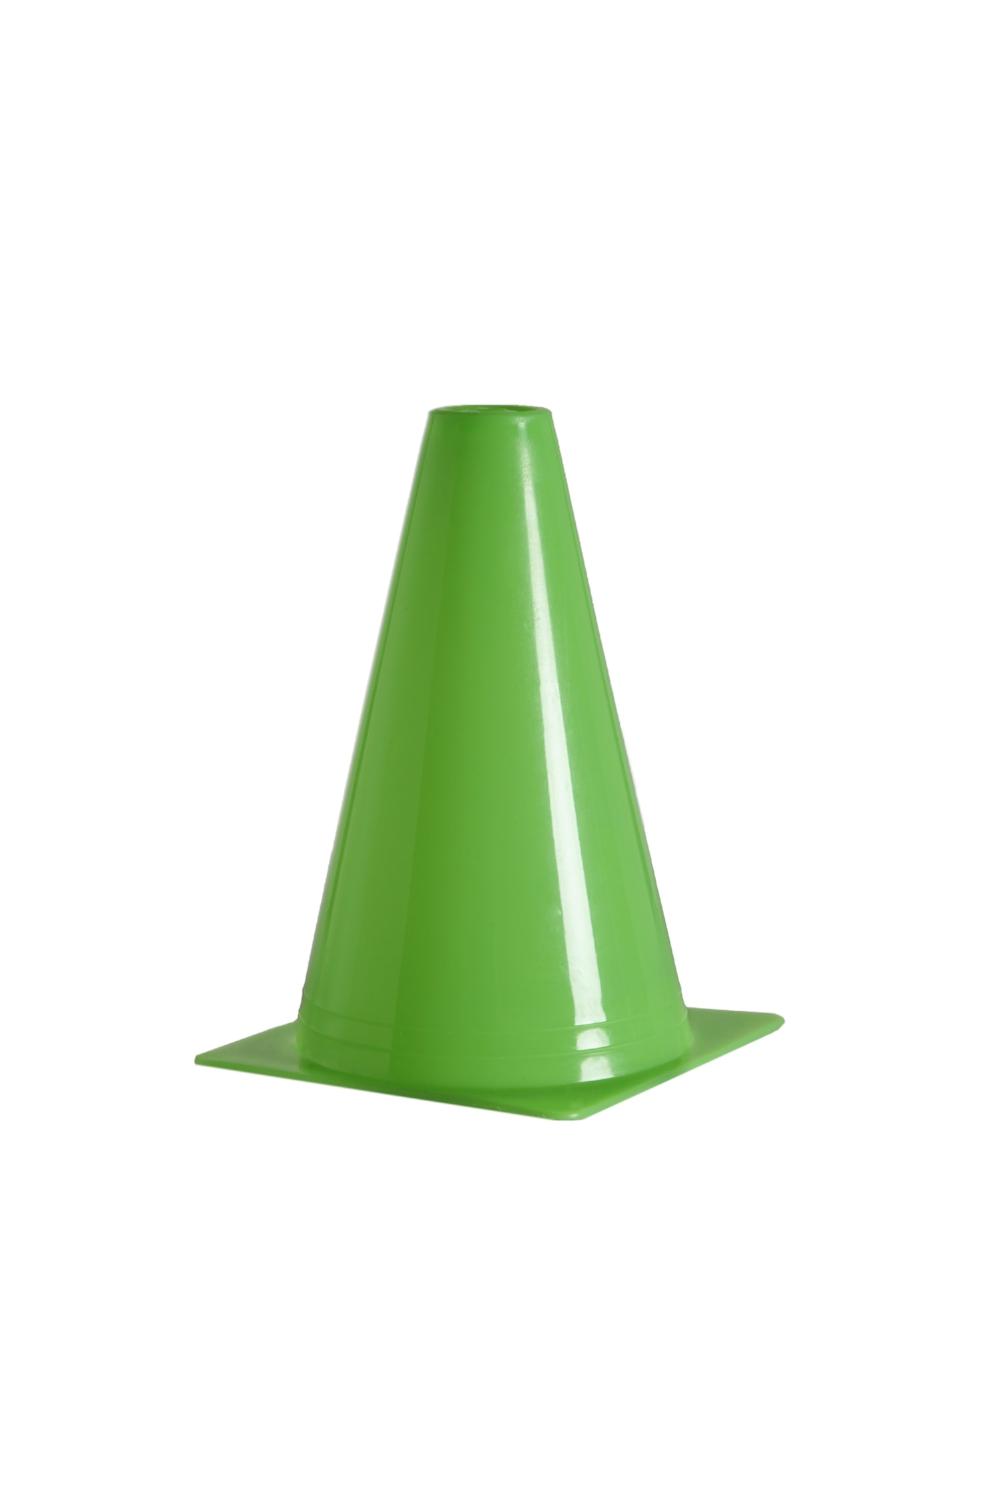 Tall Soccer Cone Green.jpg